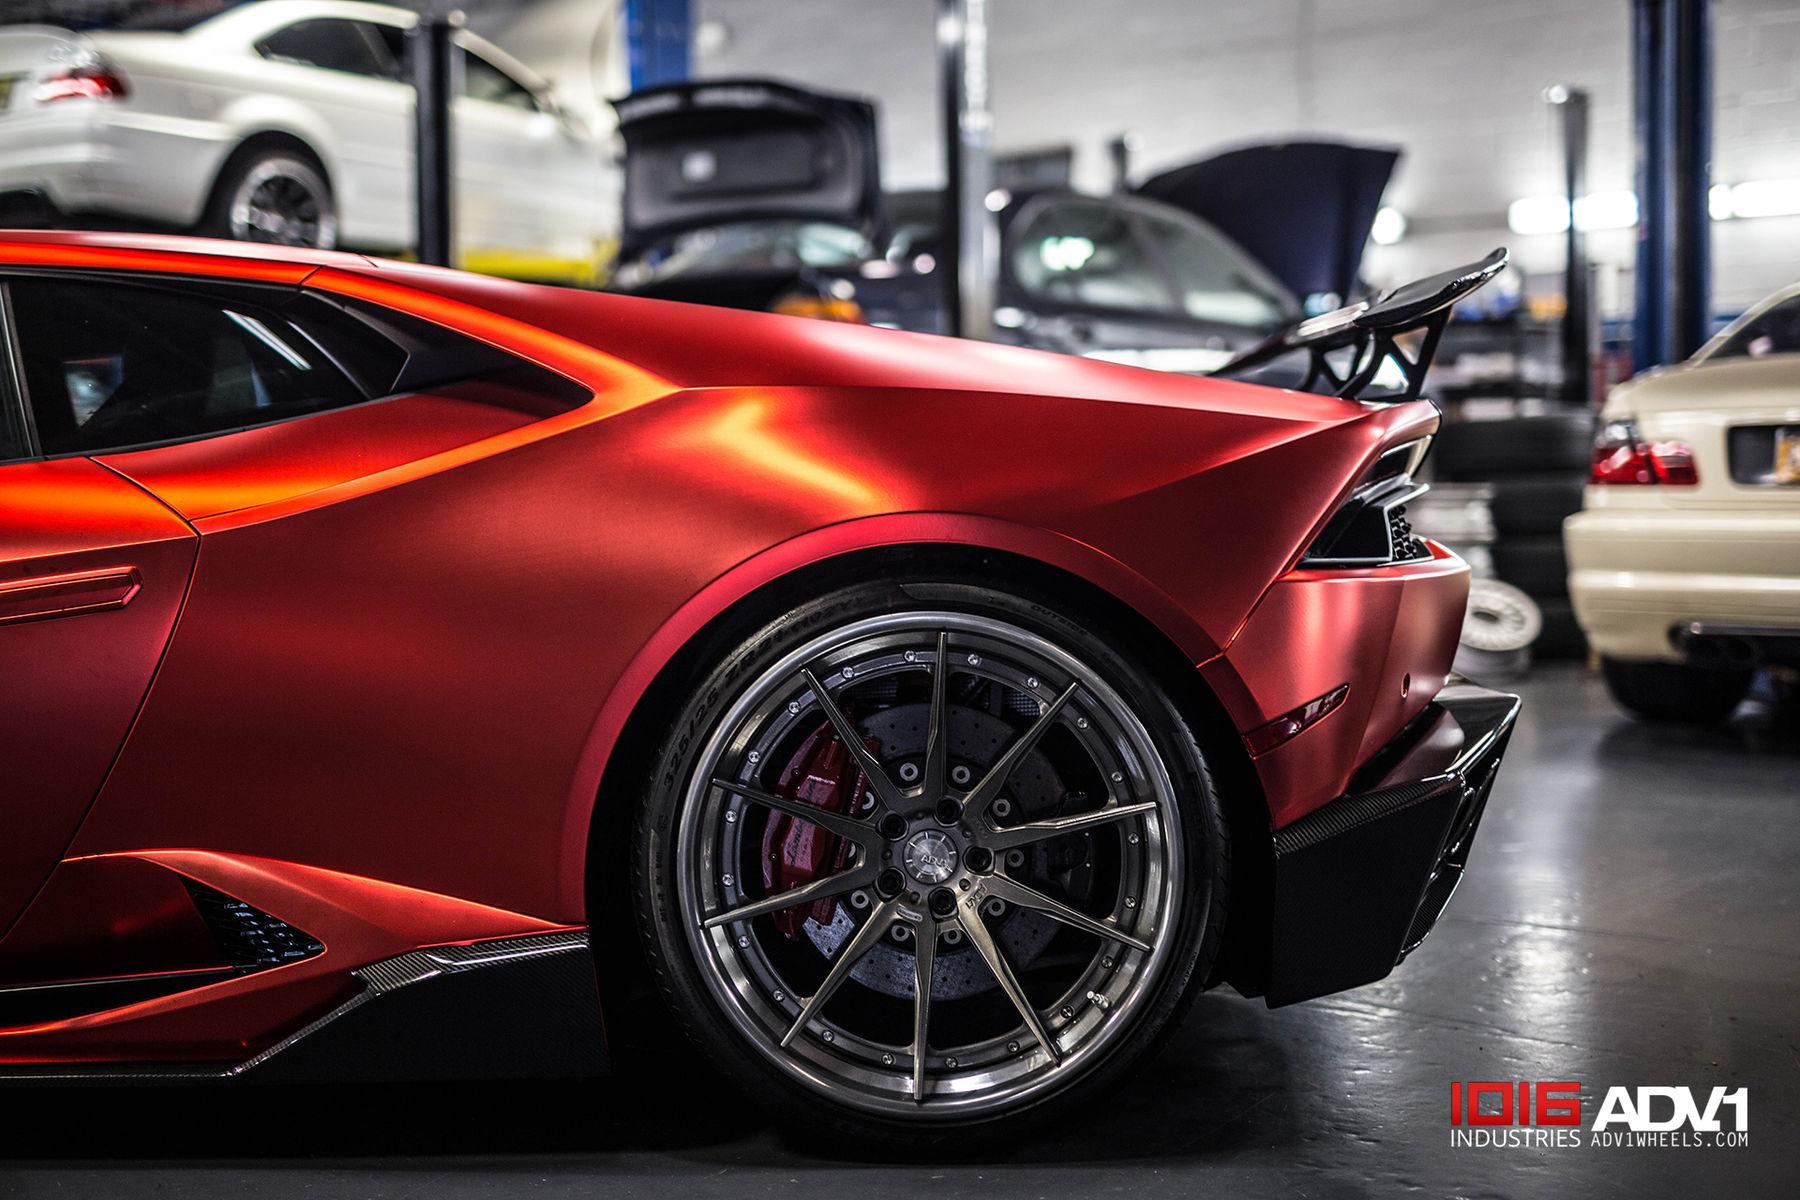 2017 Lamborghini Huracan   Satin Metallic Red Lamborghini Huracan LP610-4